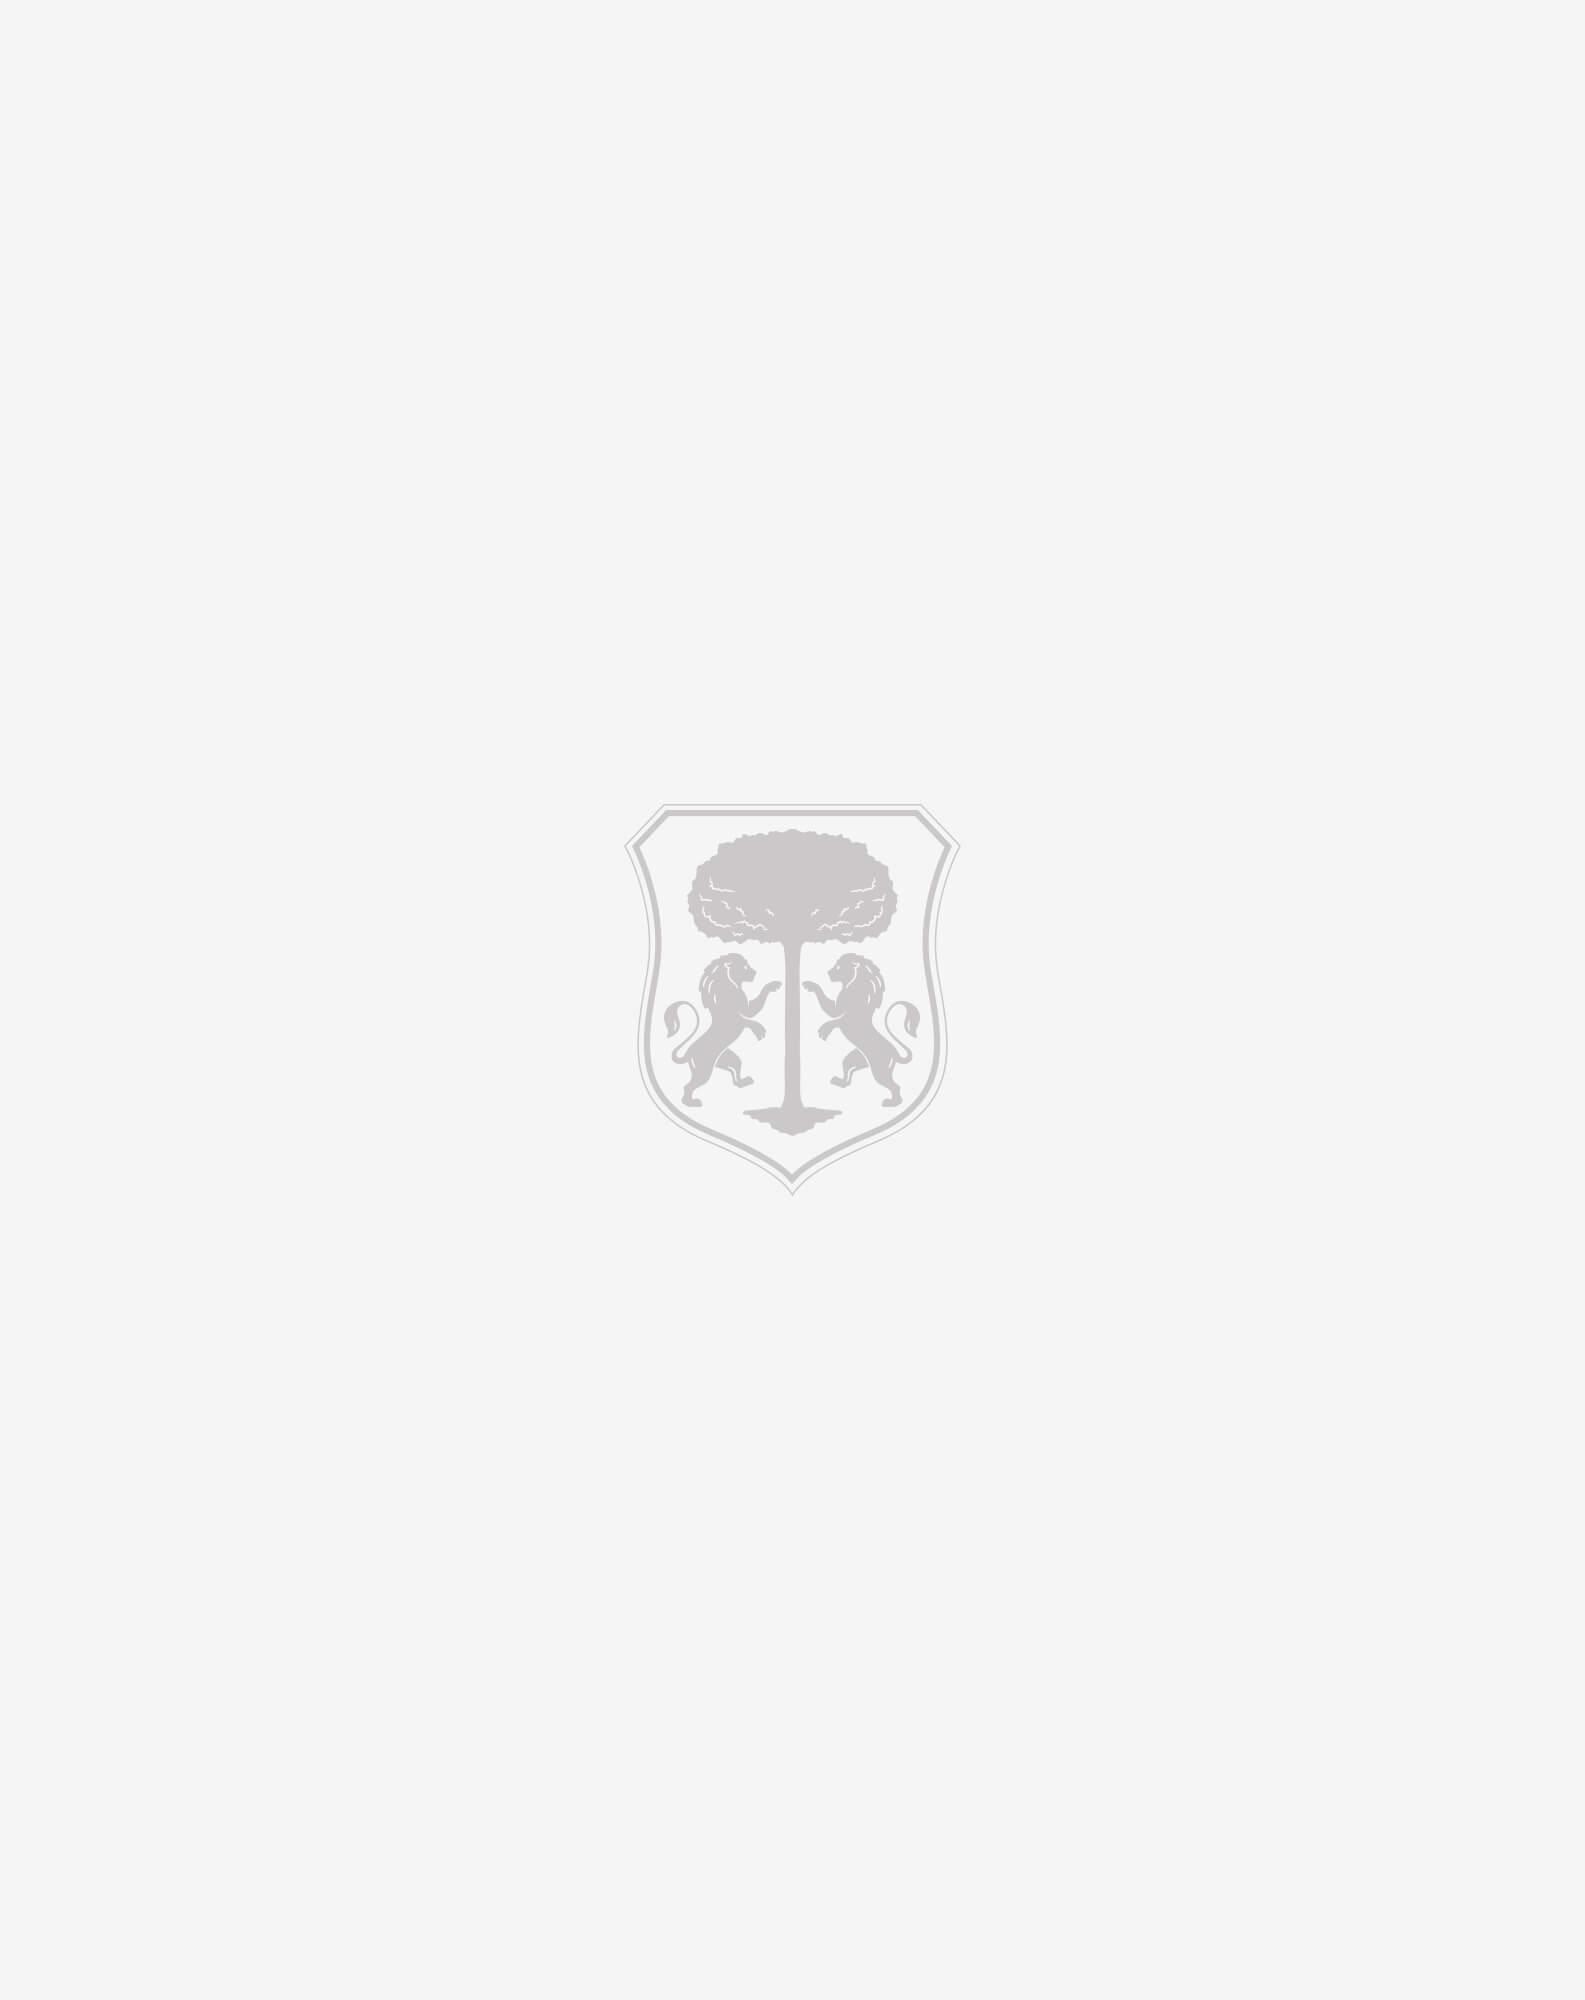 Blue jacquard tie with micro design